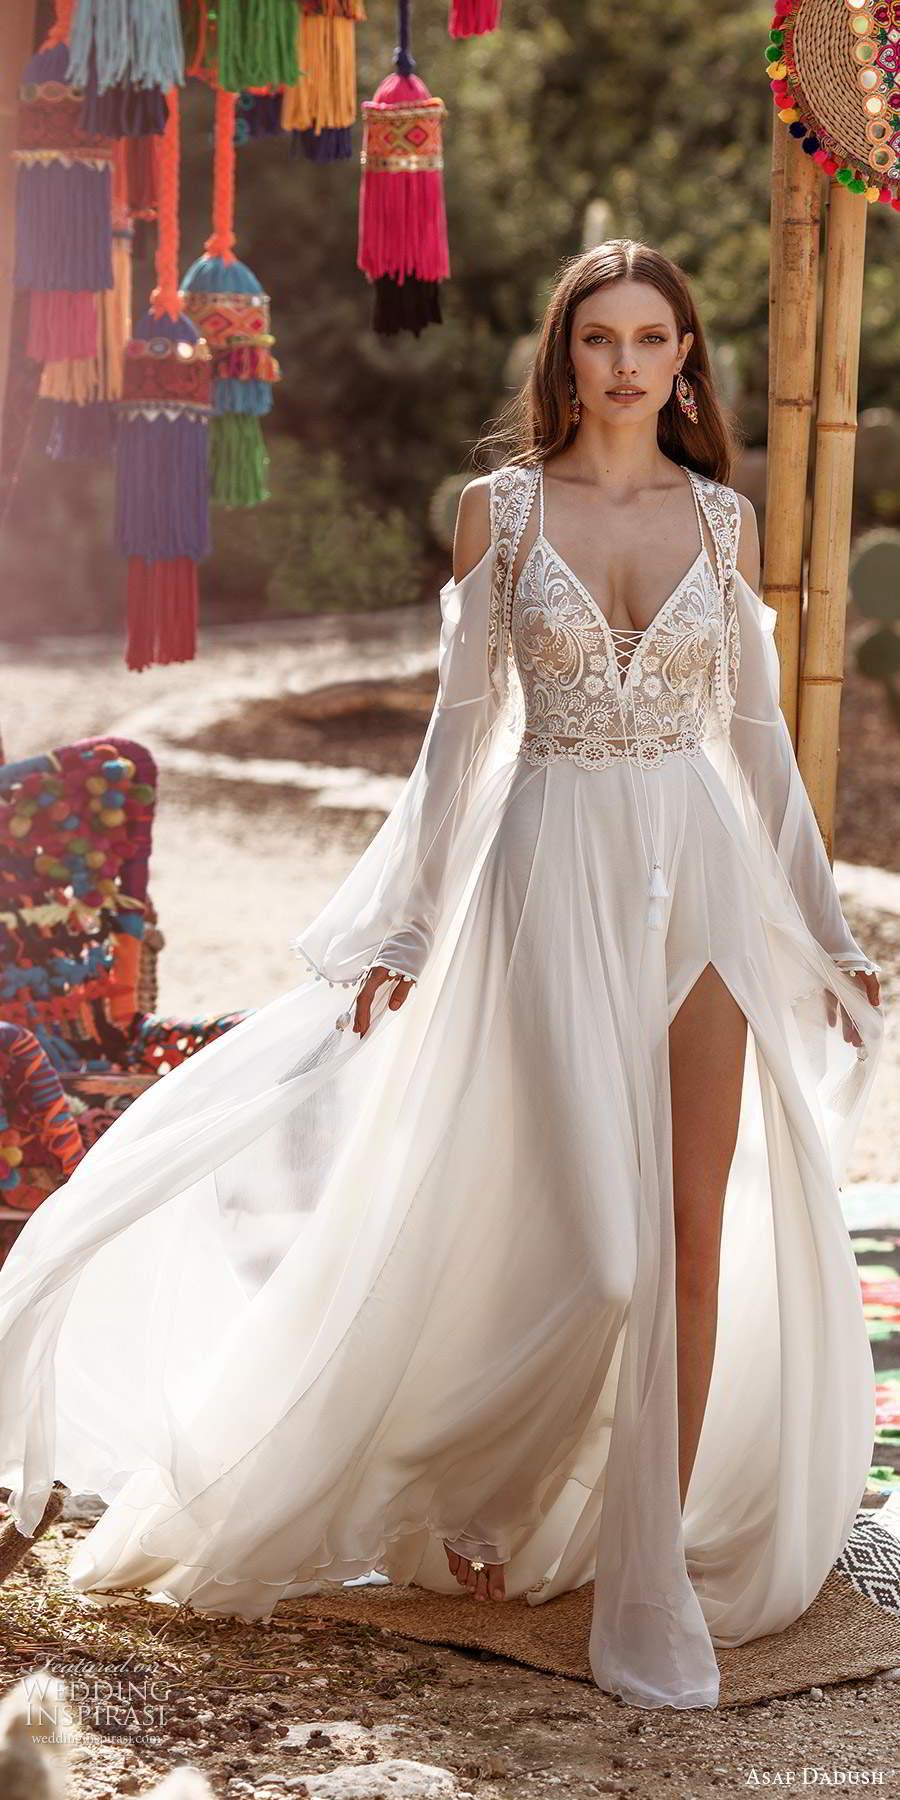 asaf dadush 2020 bridal sleeveless thin straps plunging v neckline embellished bodice clean skirt a line wedding dress slit skirt low back long sleeve jacket (3) mv